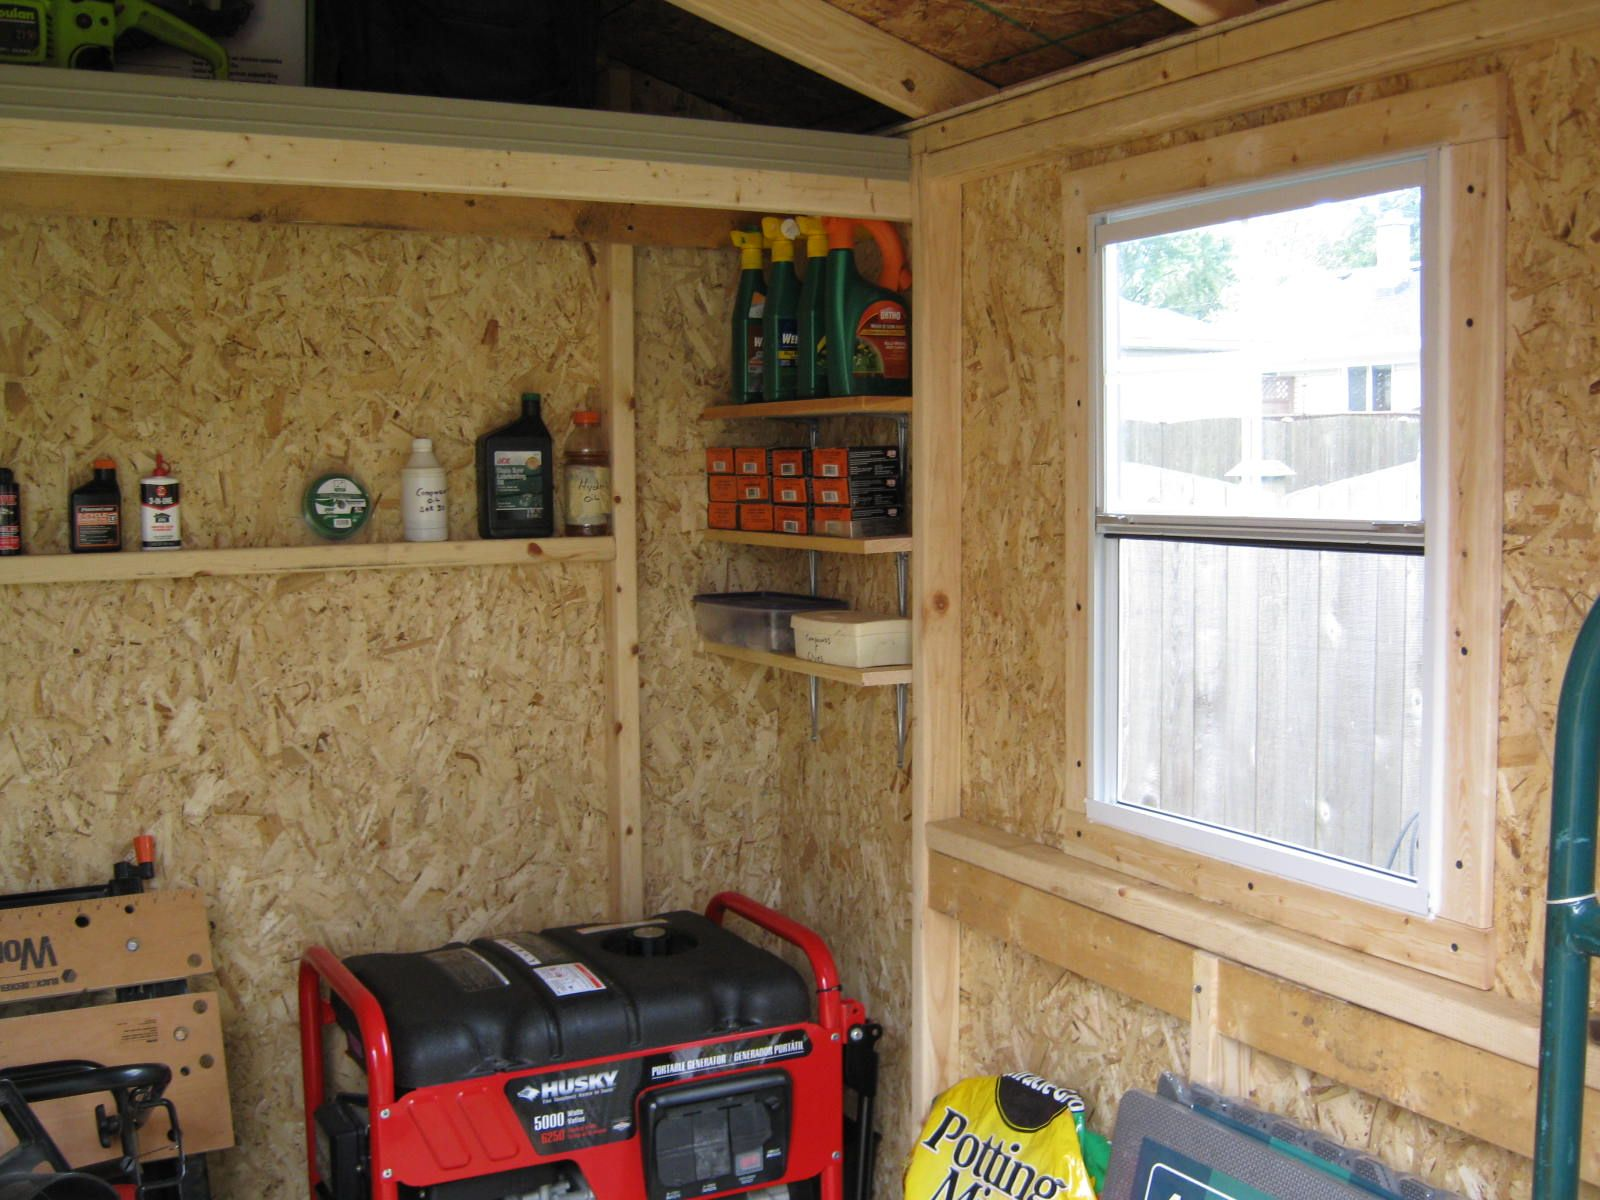 10x8 Shed Seneca Affordable Sheds Gable Style Shed Interior Wood Shed Plans Shed Plans